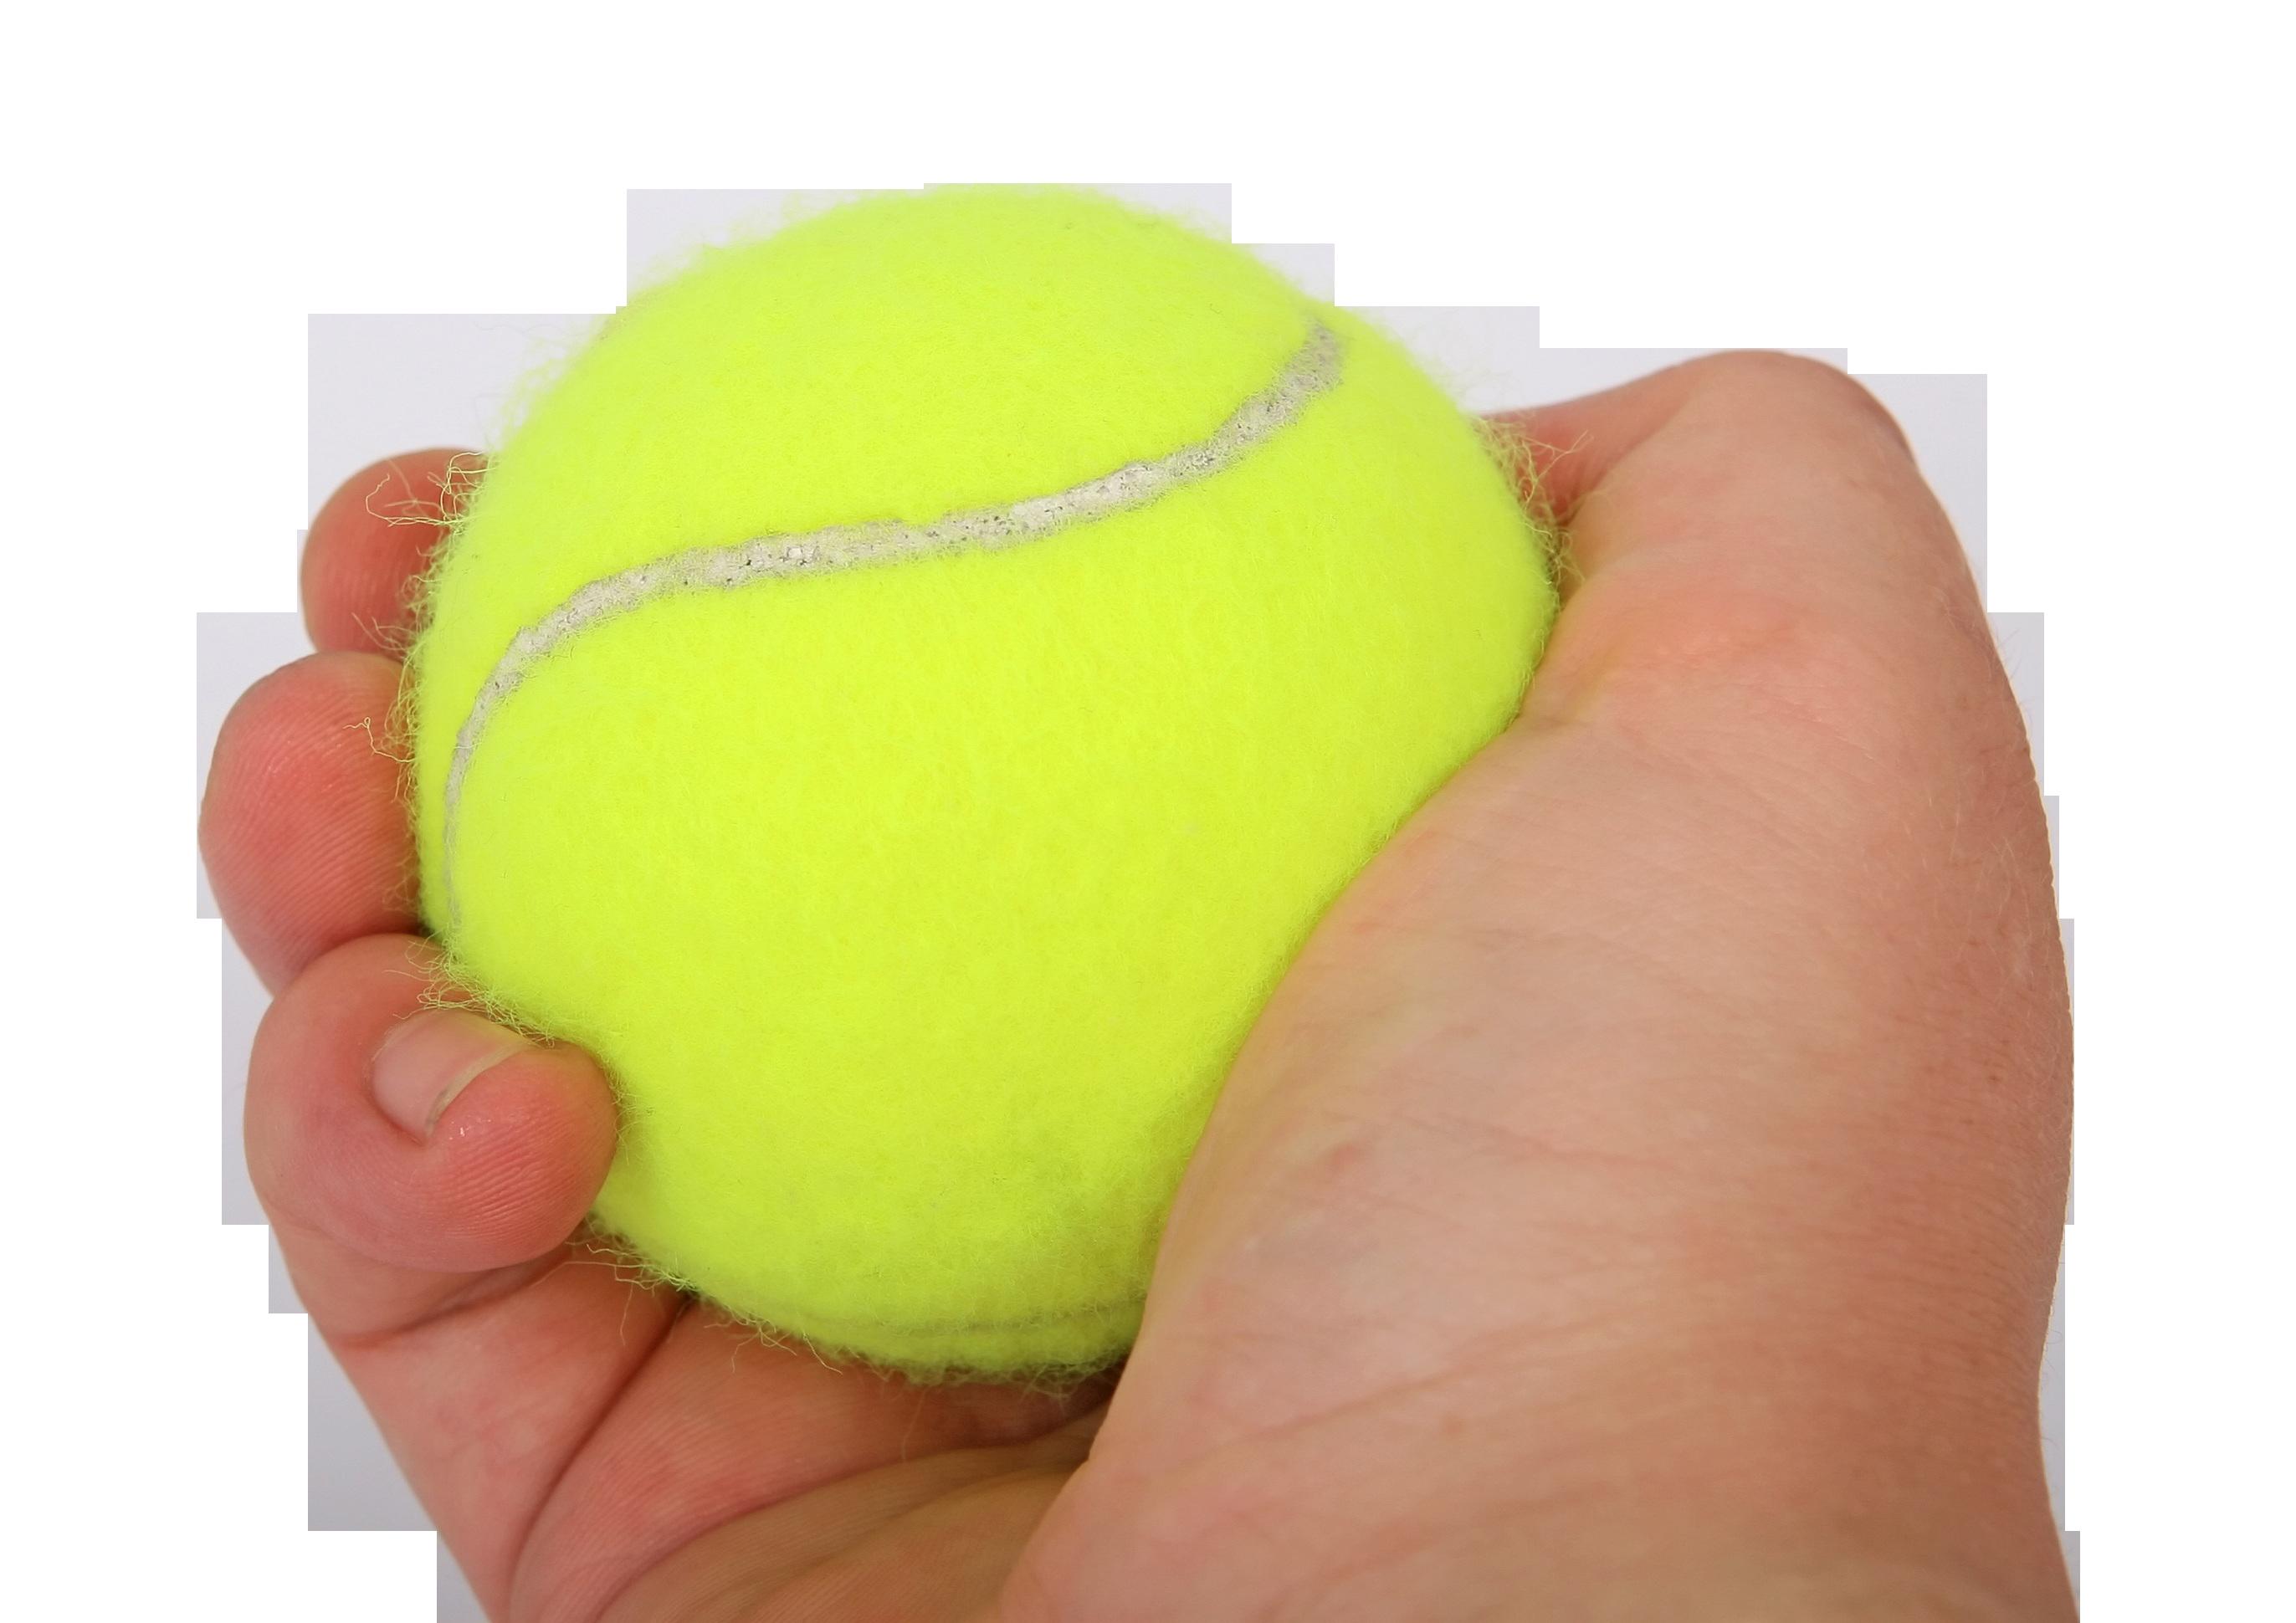 Tennis Ball in Hand